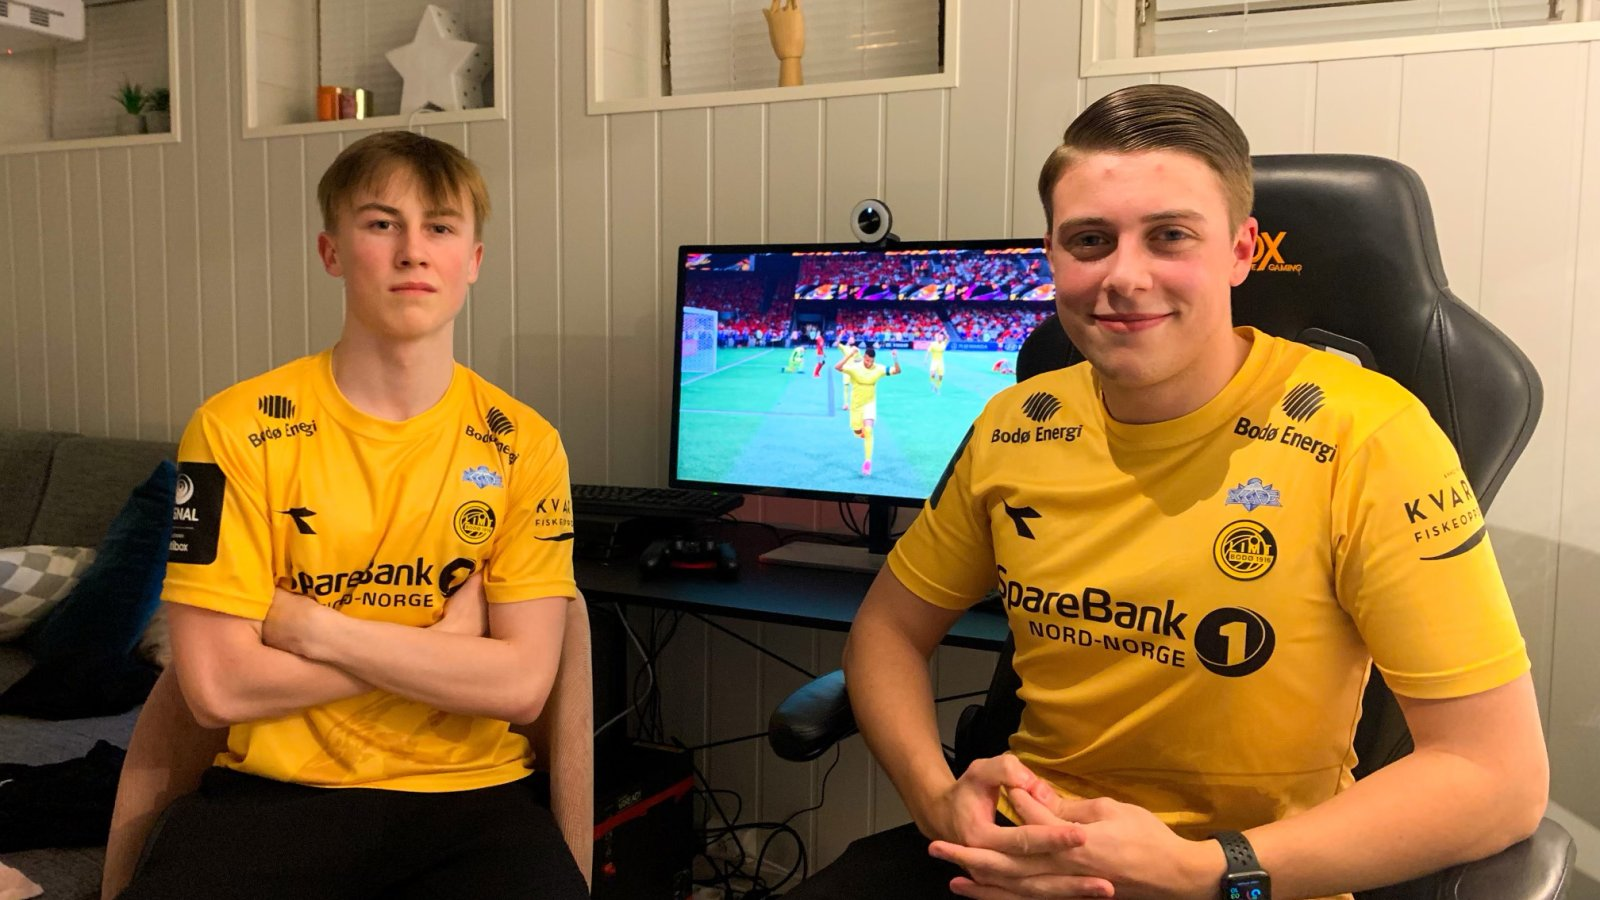 Isak Øvrevold og Max Garcia. Altibox eSerien. E-sport 2020. Bodø/Glimt.